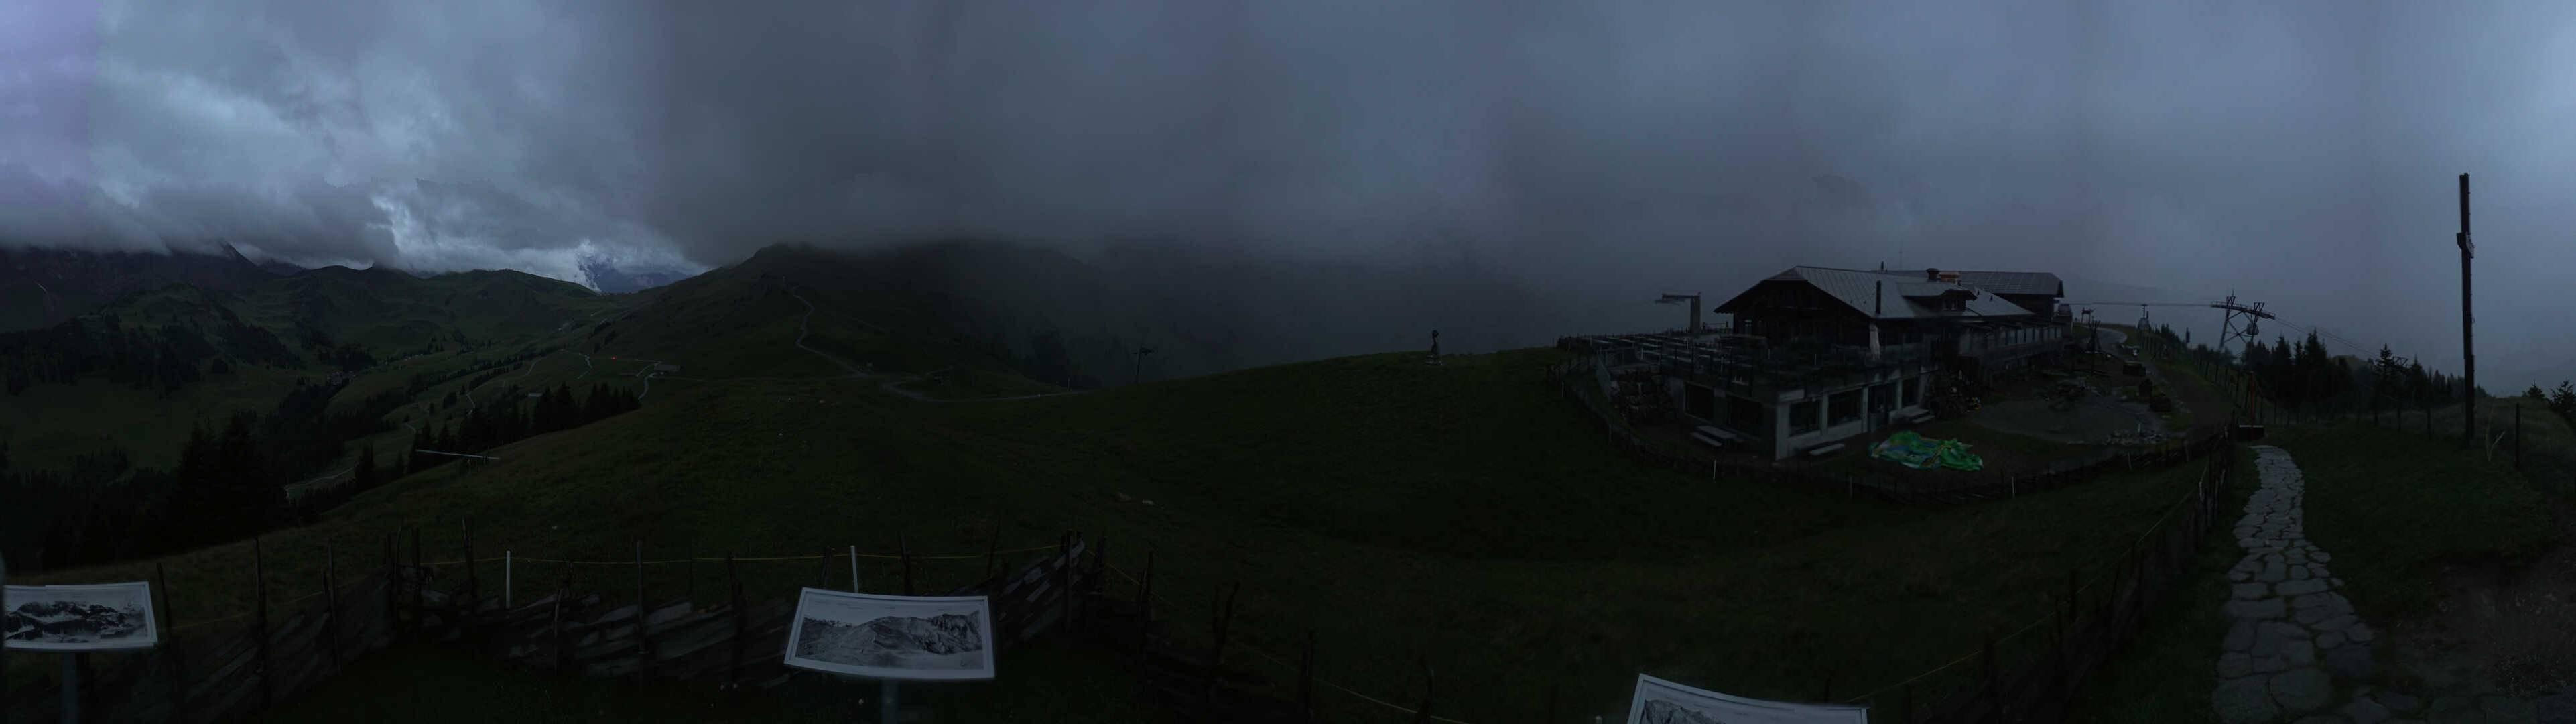 Adelboden Sillerenbühl panorama webcam